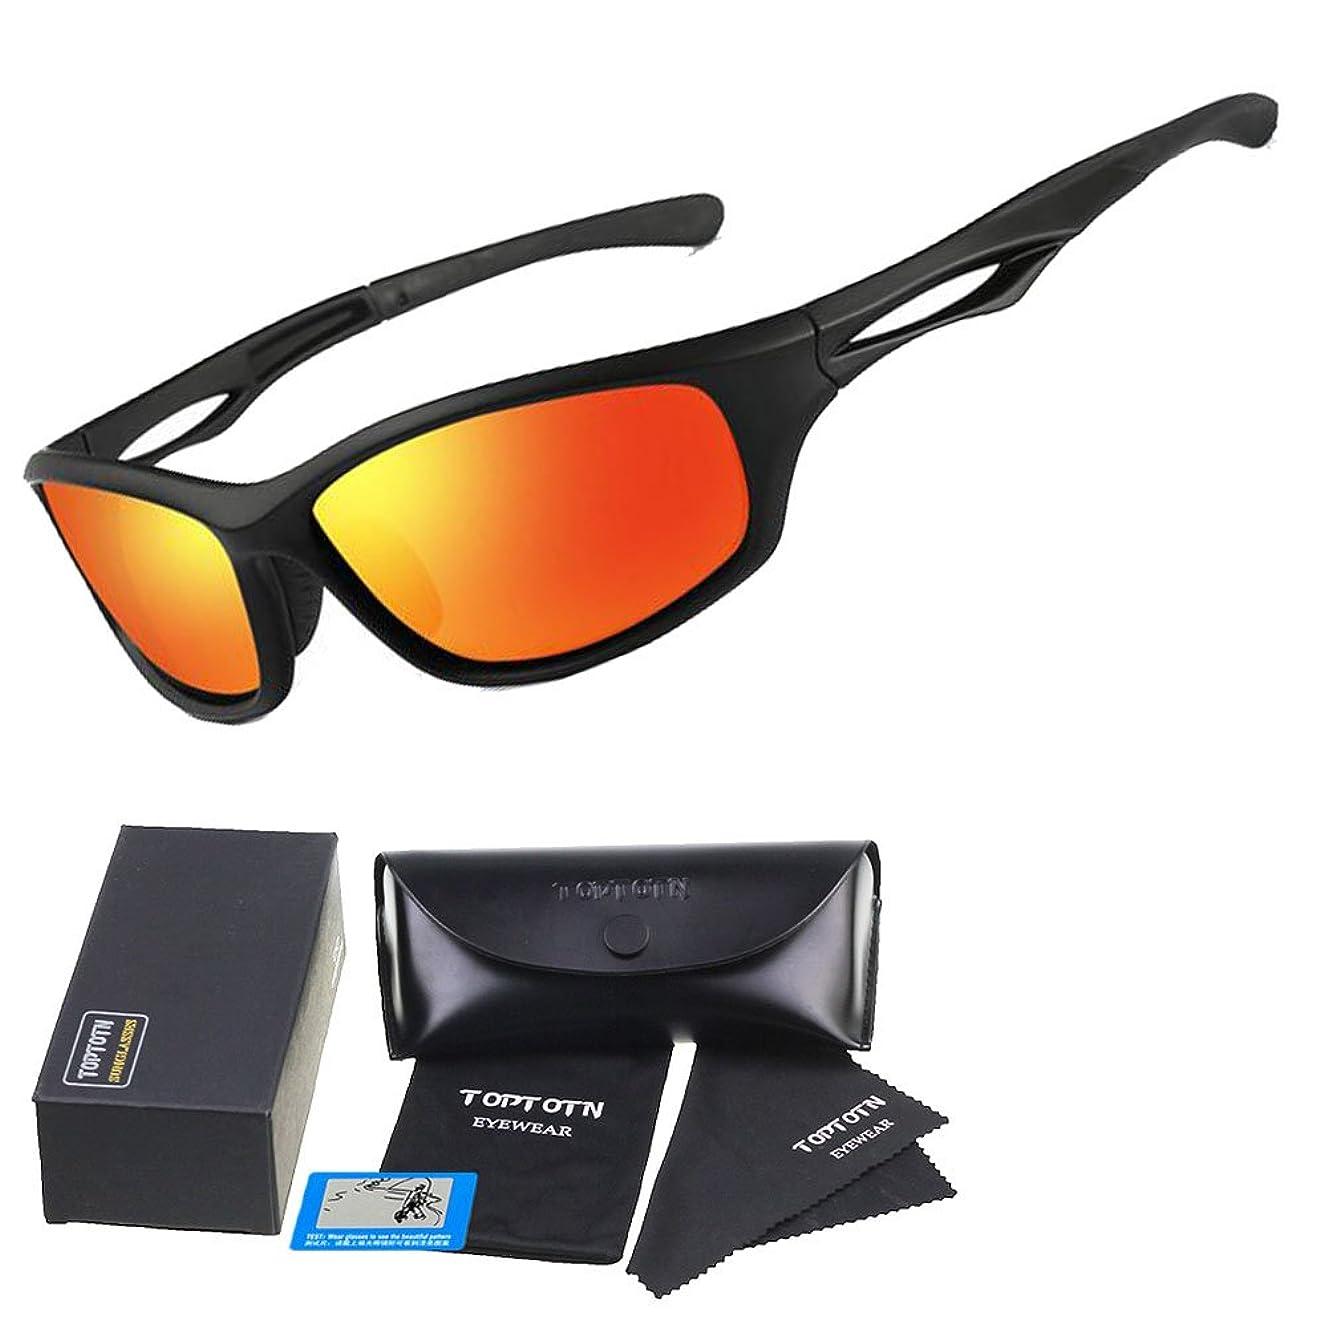 GIEADUN Polarized Sports Sunglasses for Men Women Baseball Running Cycling Sunglasses Fishing Golf Tr90 Frame